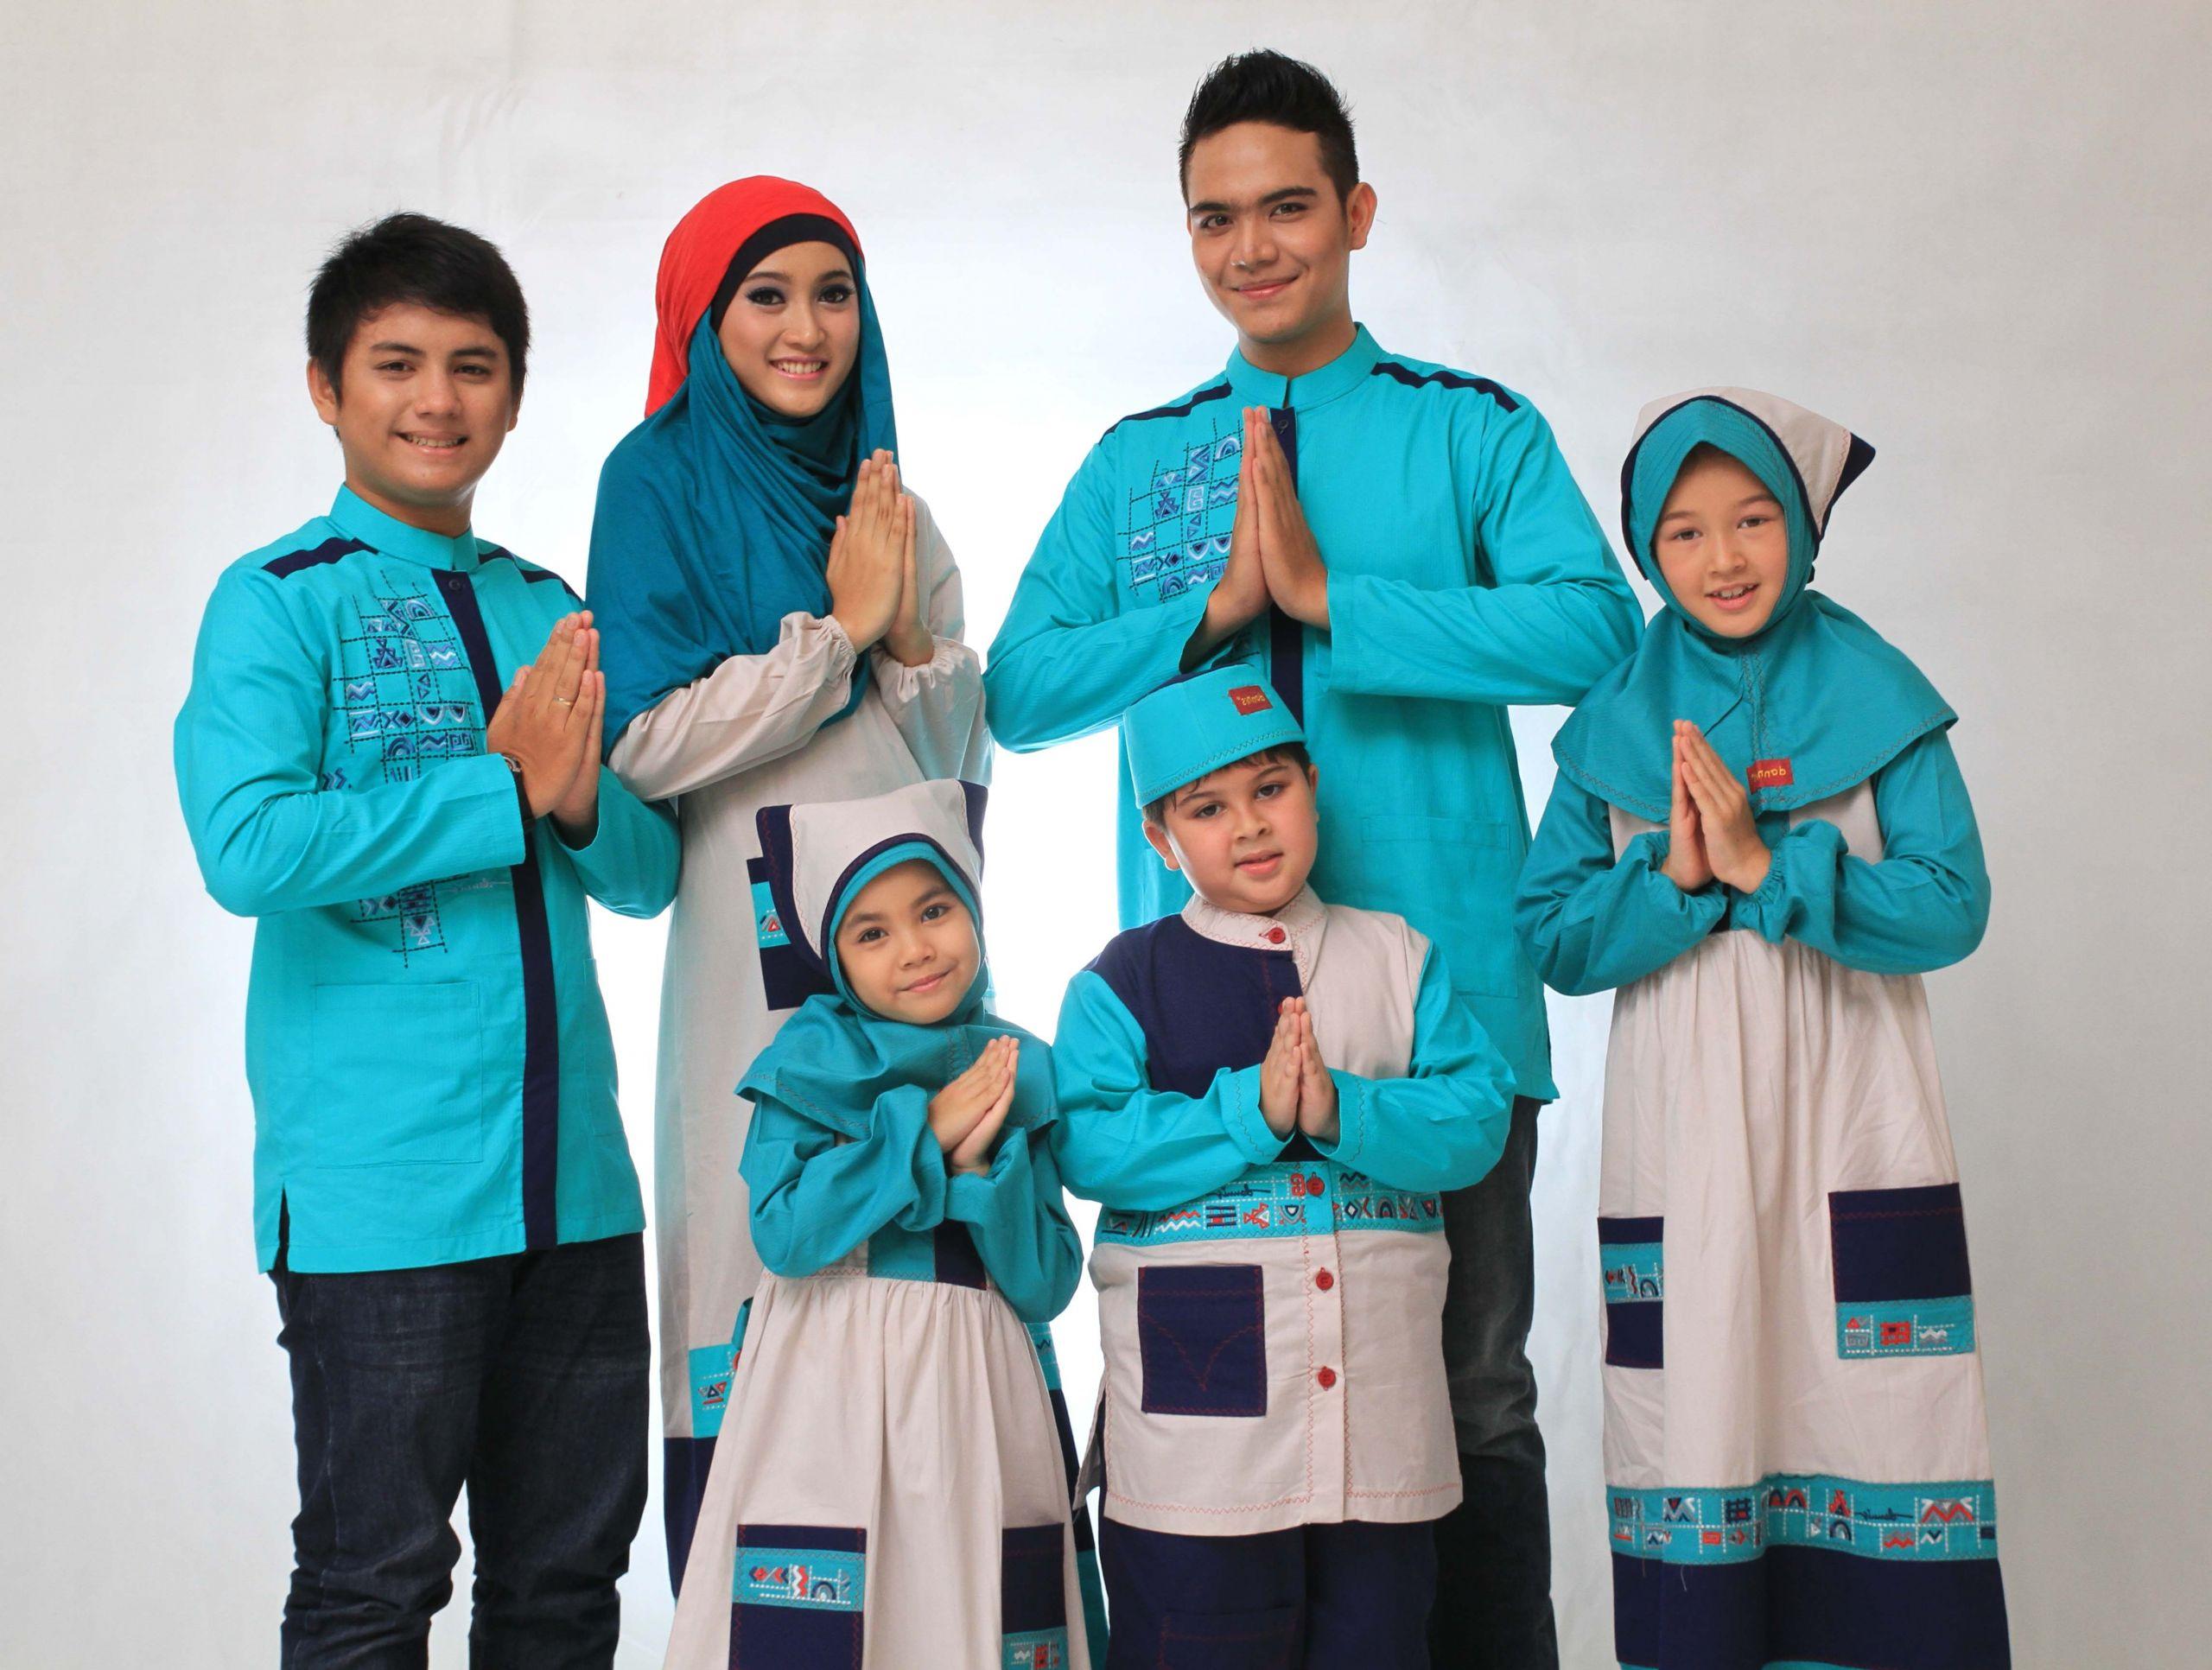 Model Inspirasi Baju Lebaran Keluarga 2019 Zwdg Baju Muslim Untuk Lebaran Berhijab